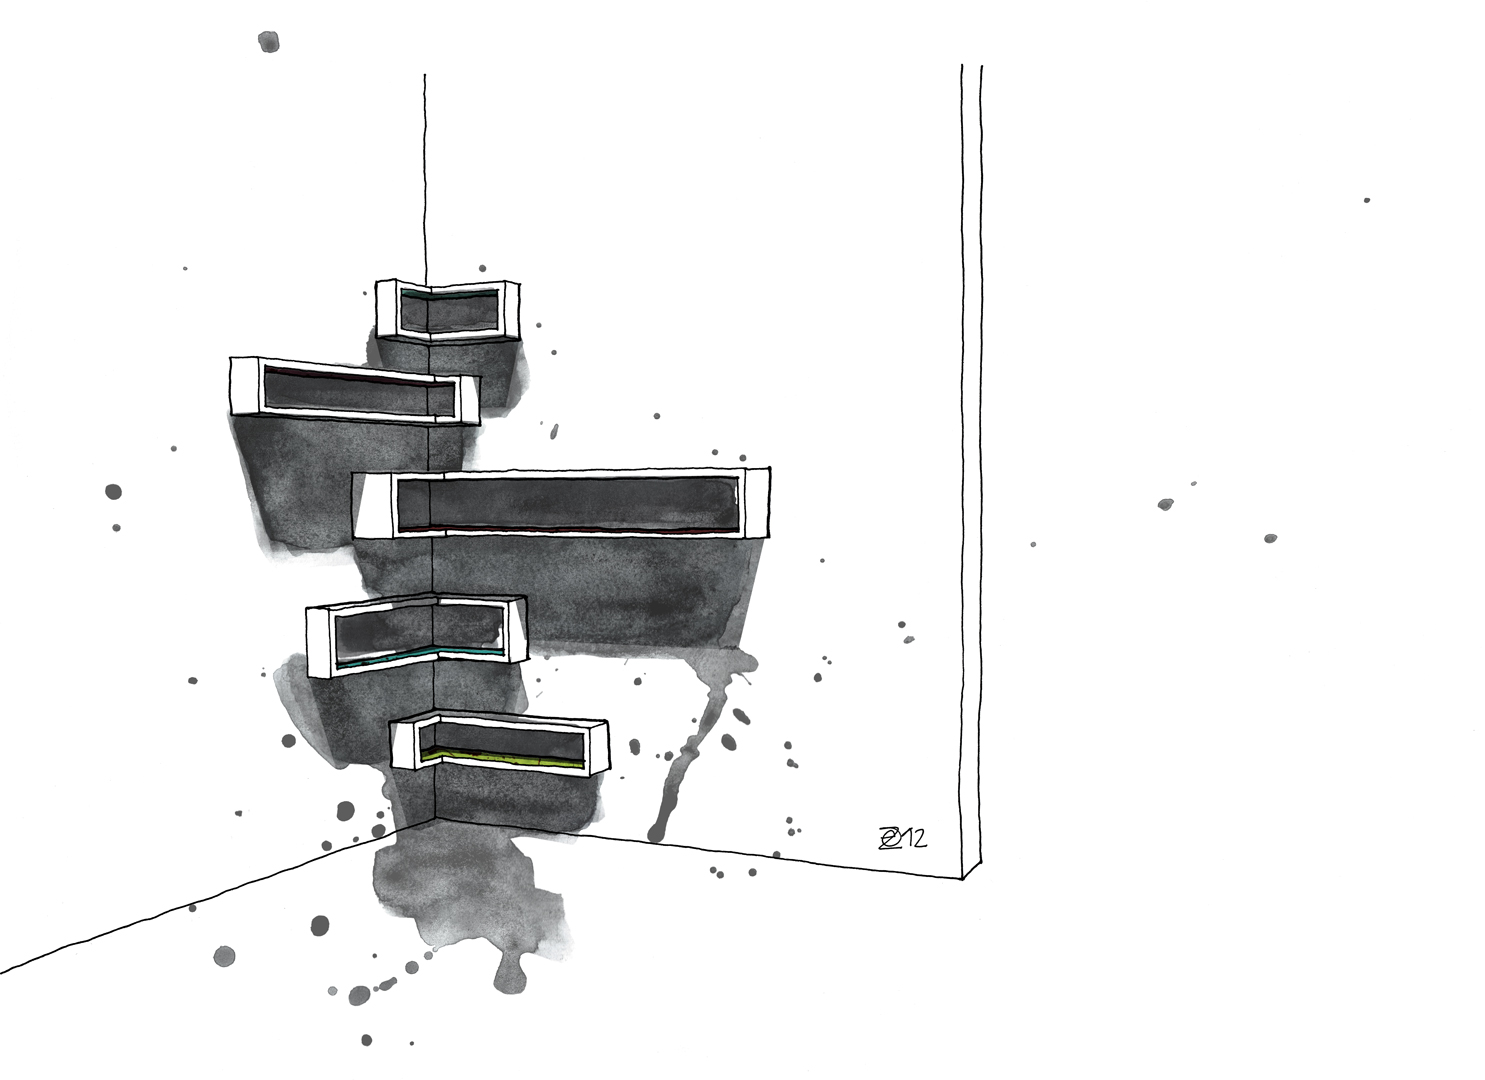 Handgefertigte Eckregale aus Berliner Holzdielen. Wall mounted corner shelves made from reclaimed floor boards. Design and furniture design illustration by Studio KERTI.